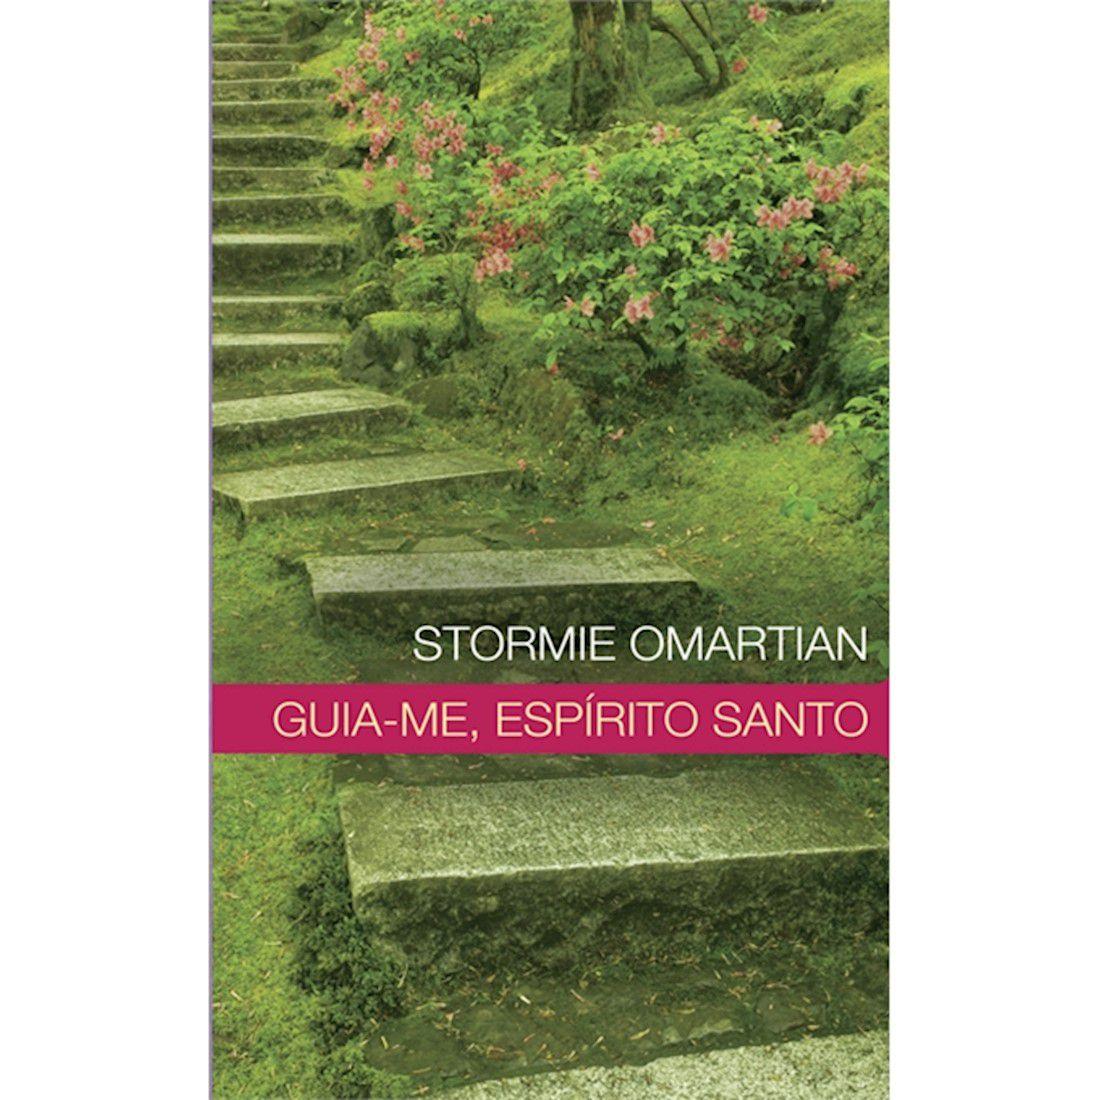 Livro Guia-me, Espírito Santo